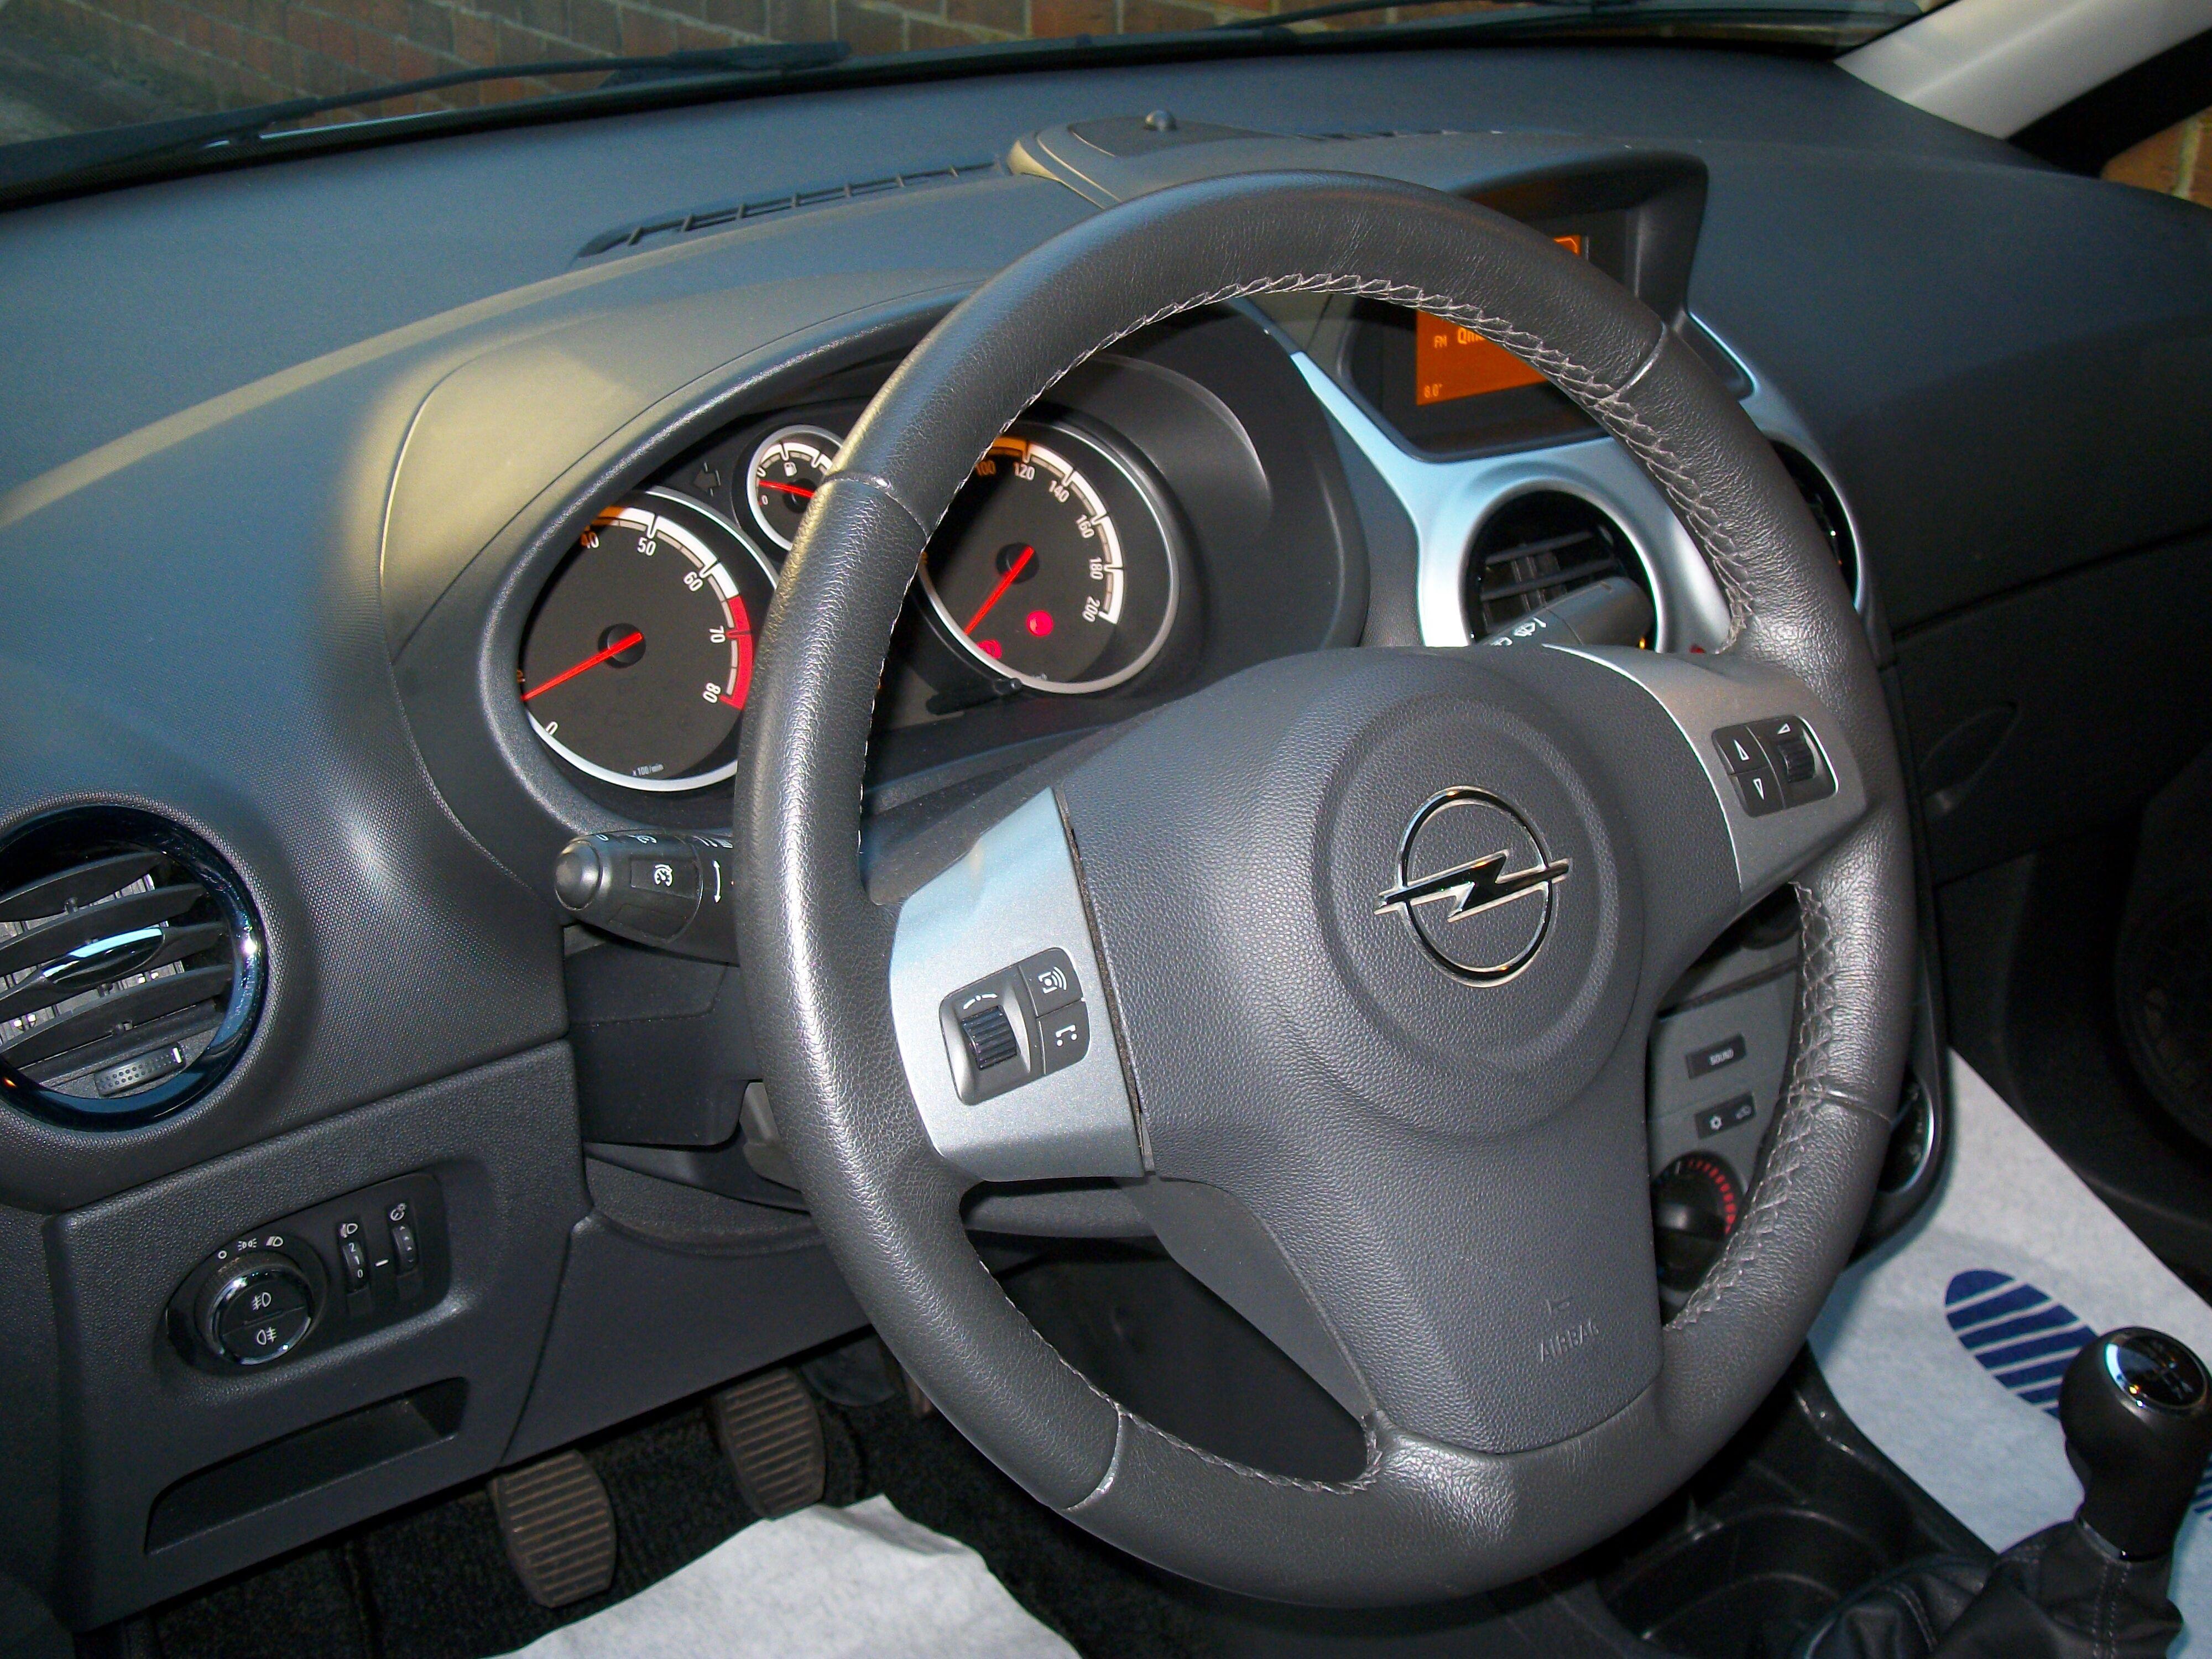 Opel CORSA - 2011 1.2 Benz - weinig kilometers 4/11